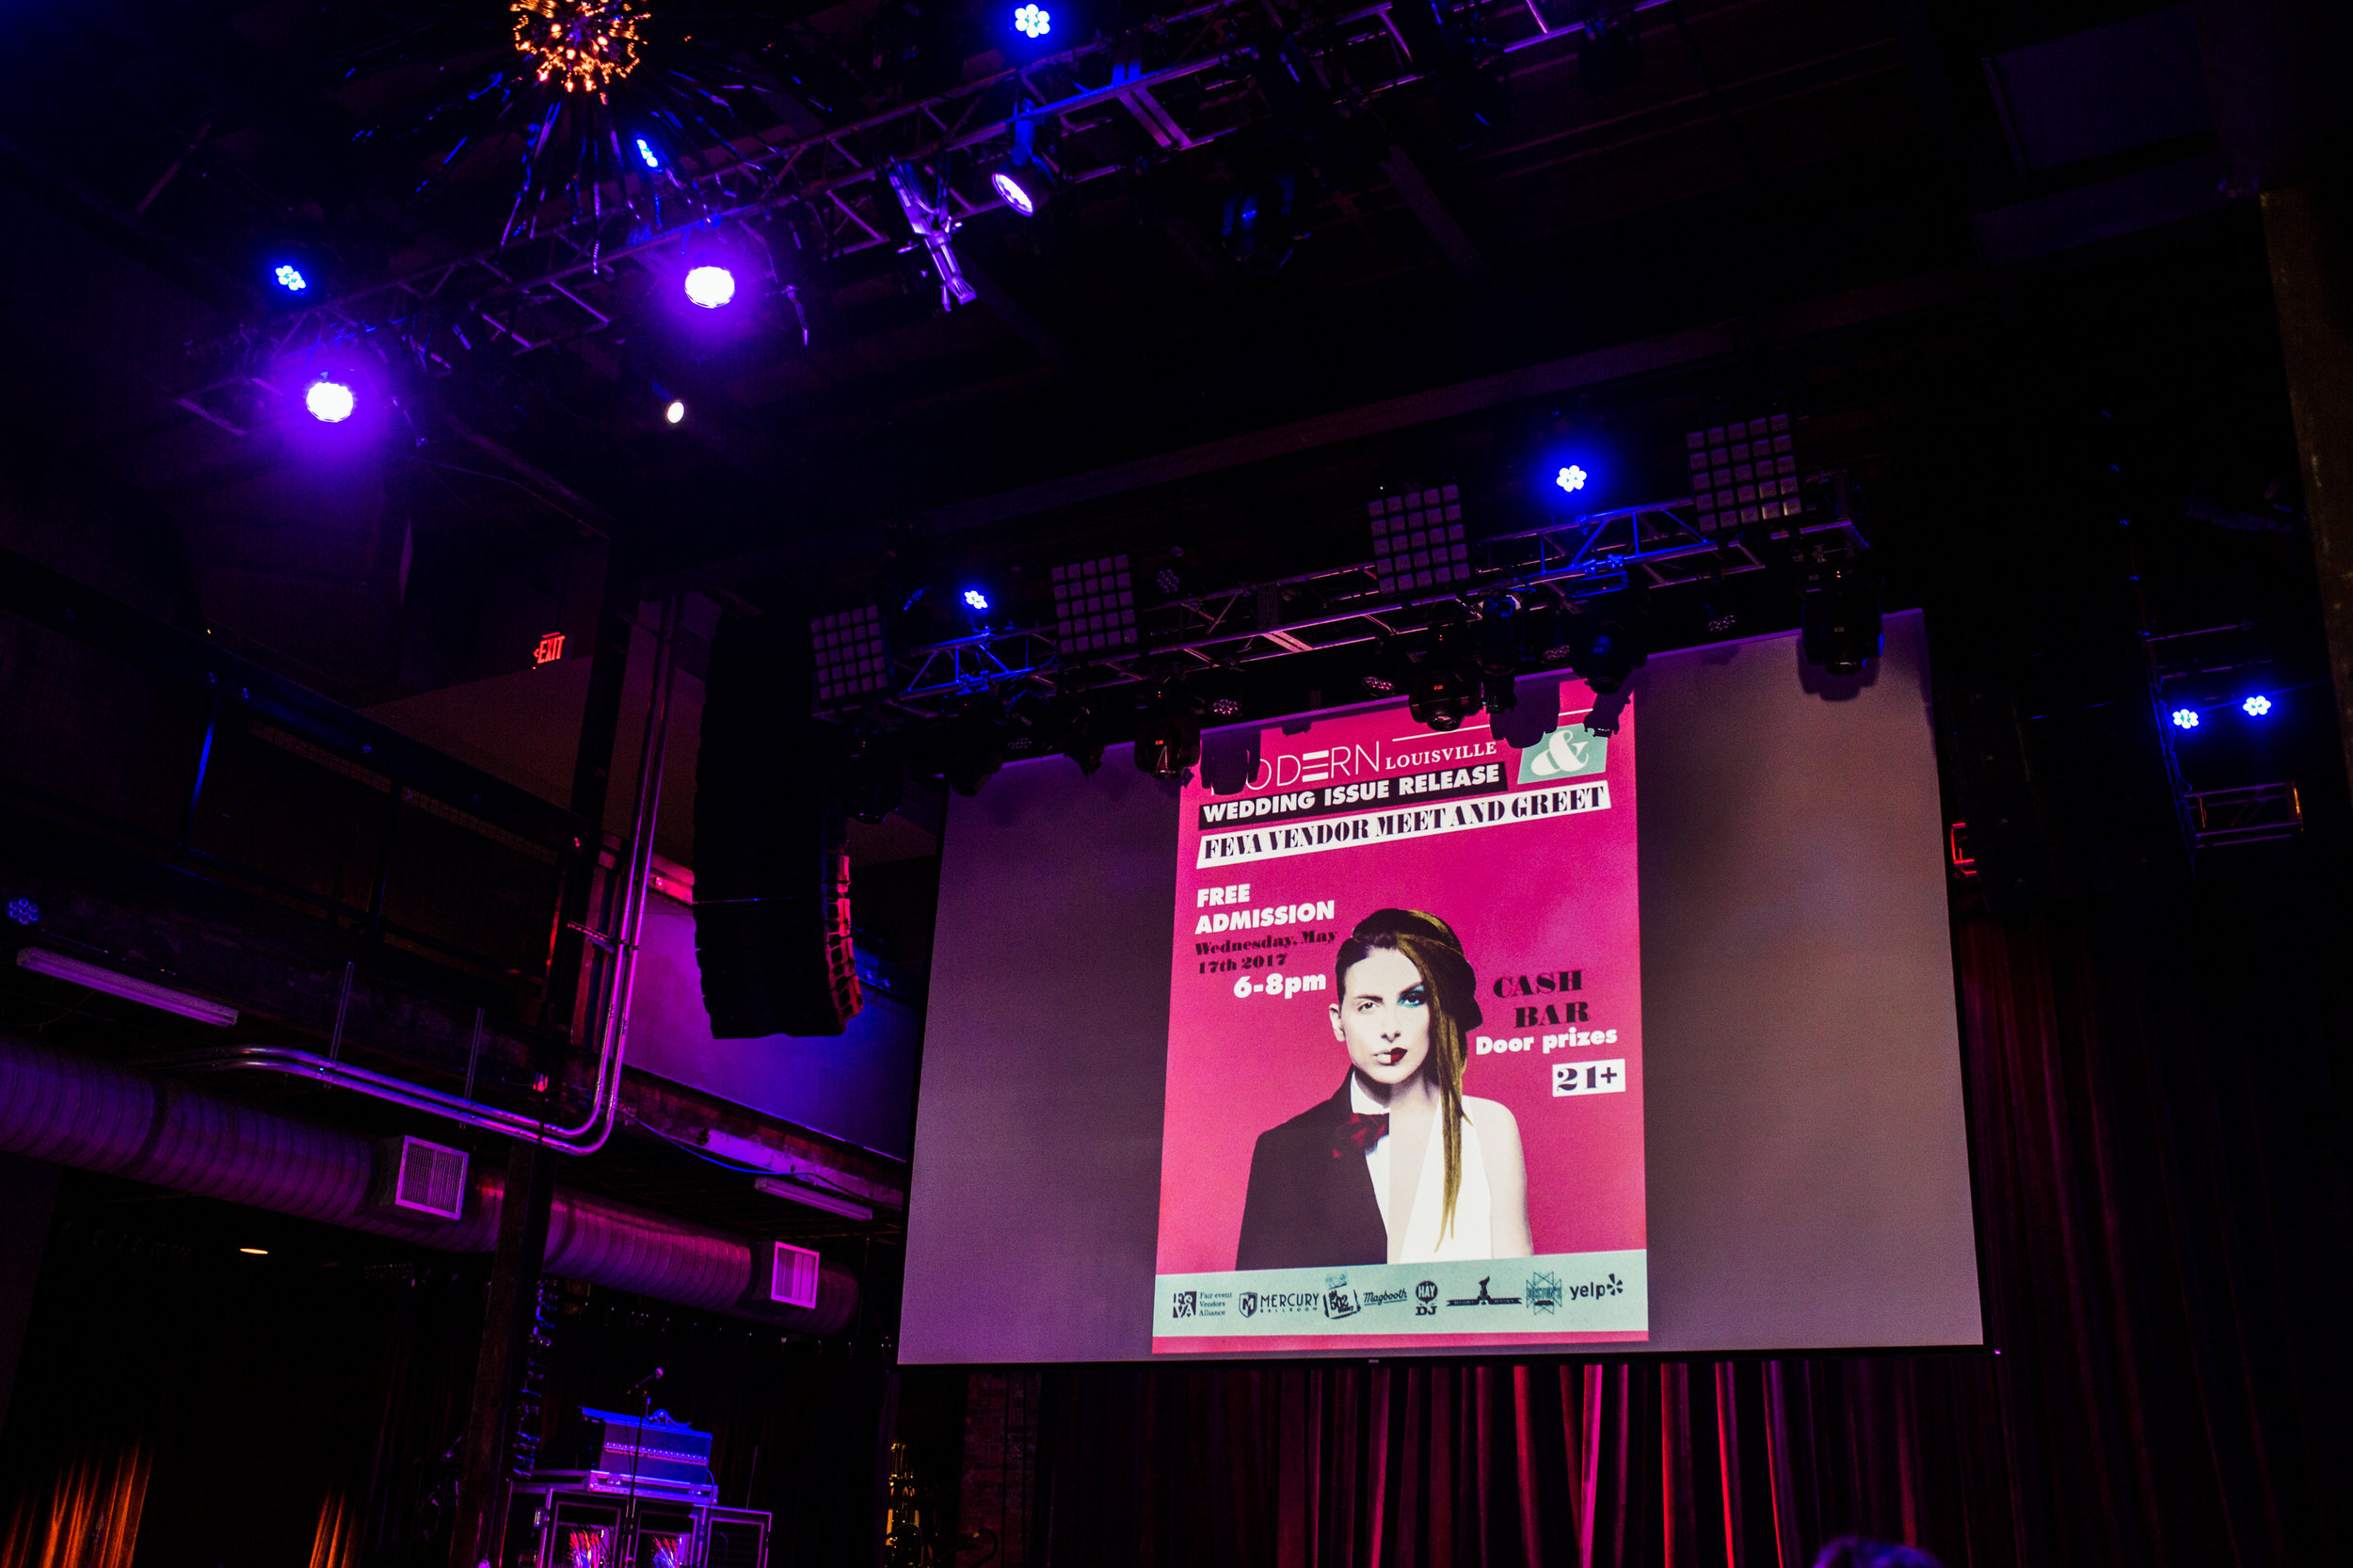 Modern Louisville Magazine Modern Vows Launch Party at Mercury Ballroom 5-17-17 Crystal Ludwick Photo 47.jpg